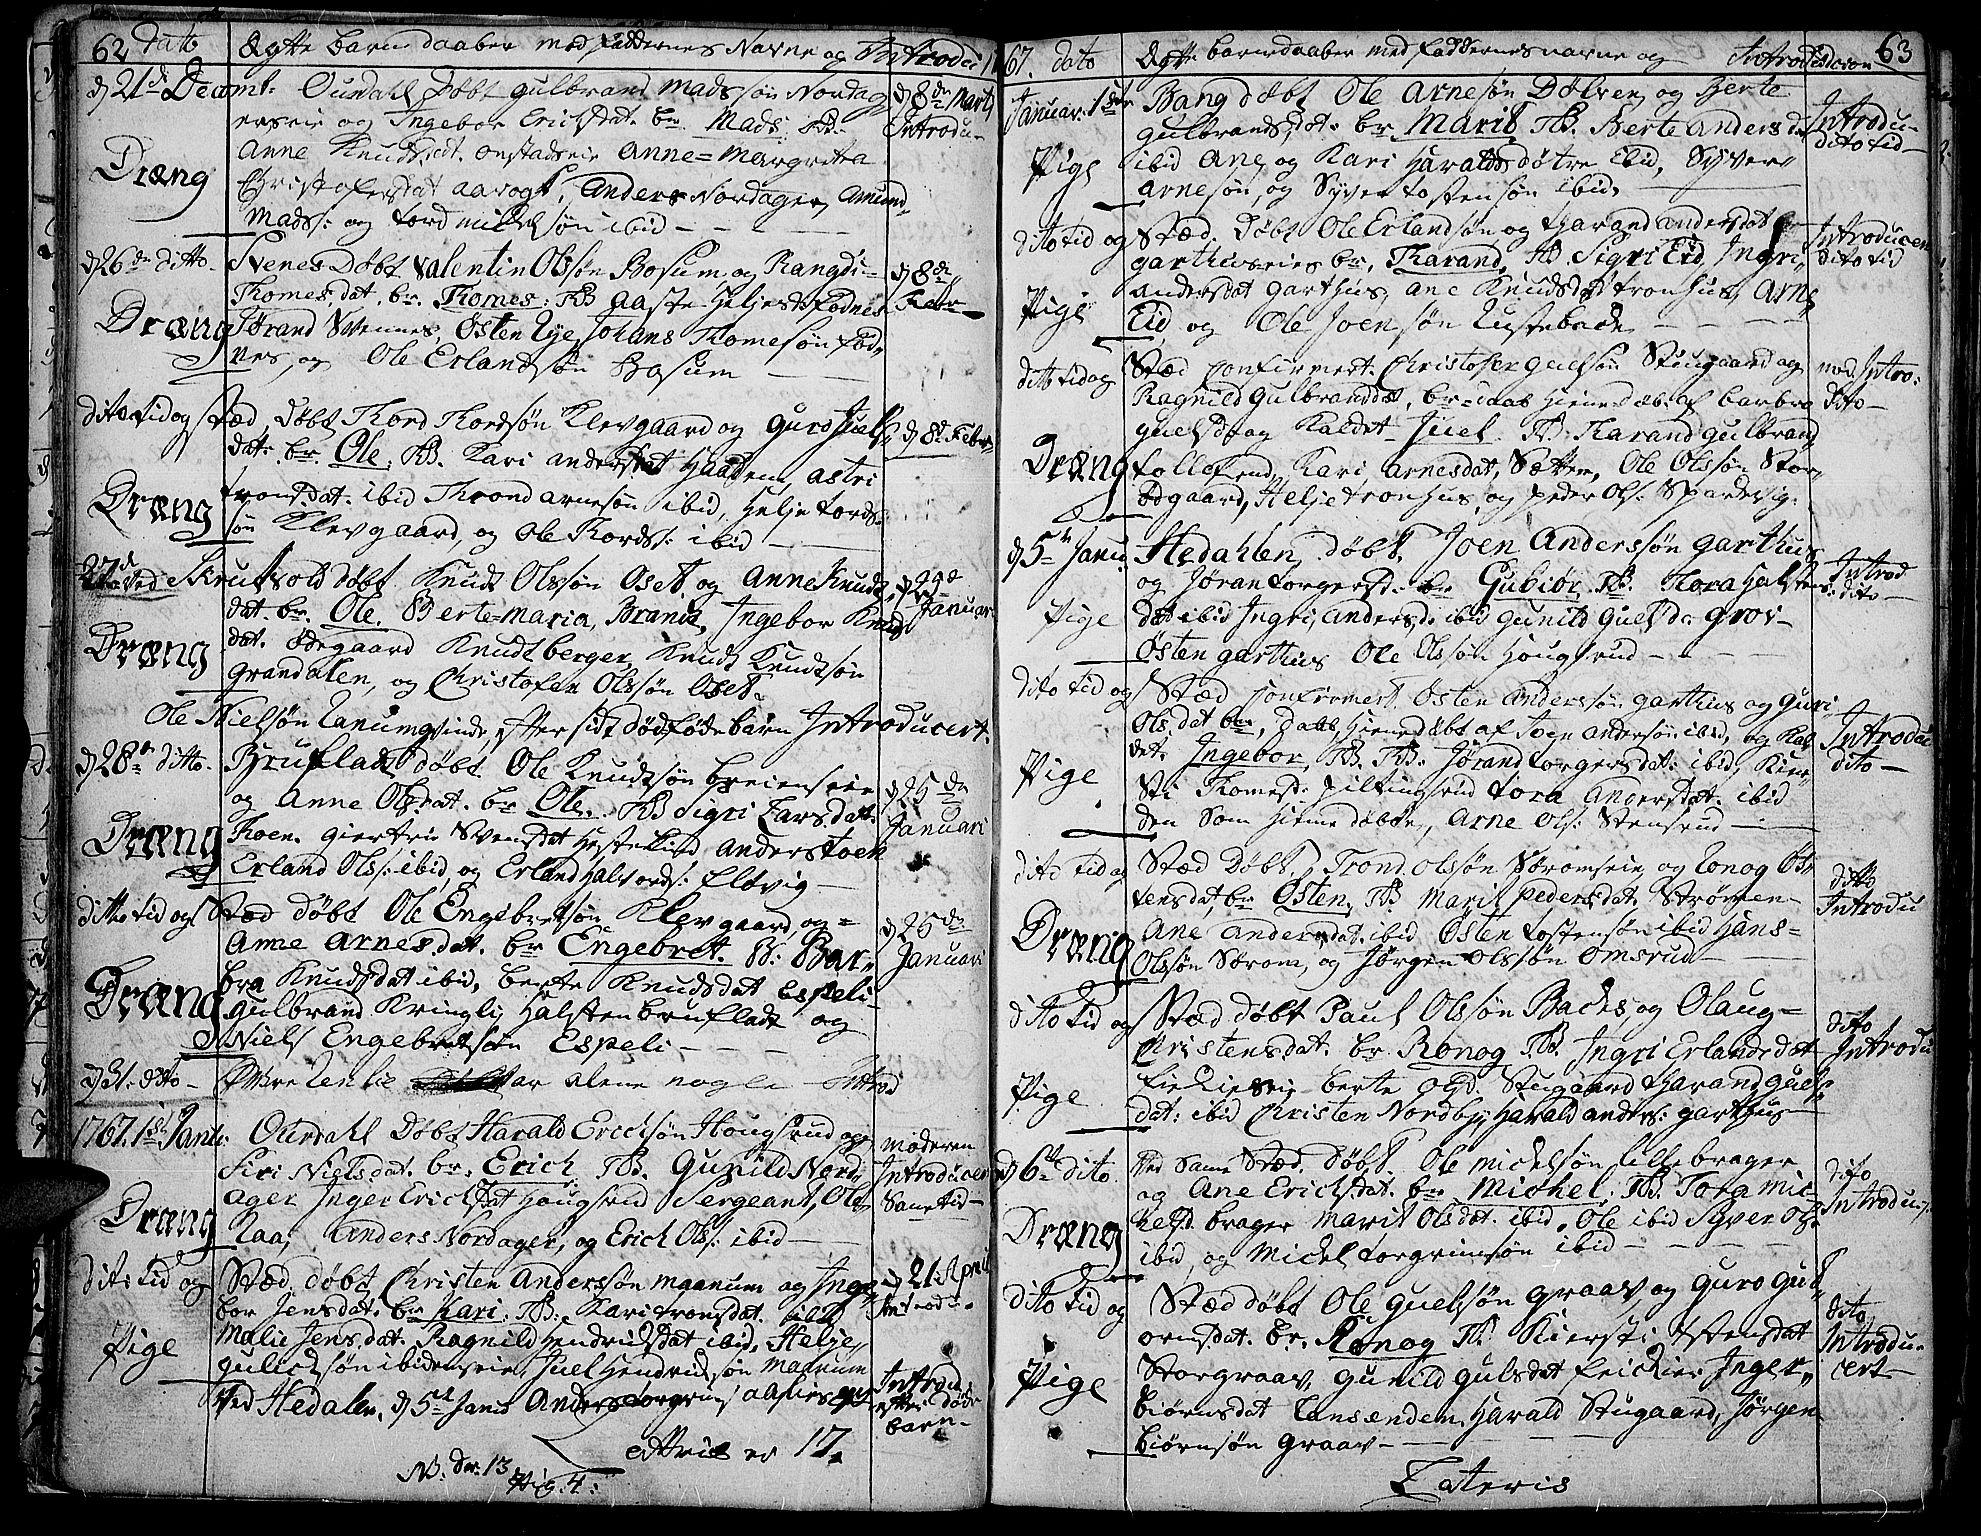 SAH, Aurdal prestekontor, Ministerialbok nr. 5, 1763-1781, s. 62-63